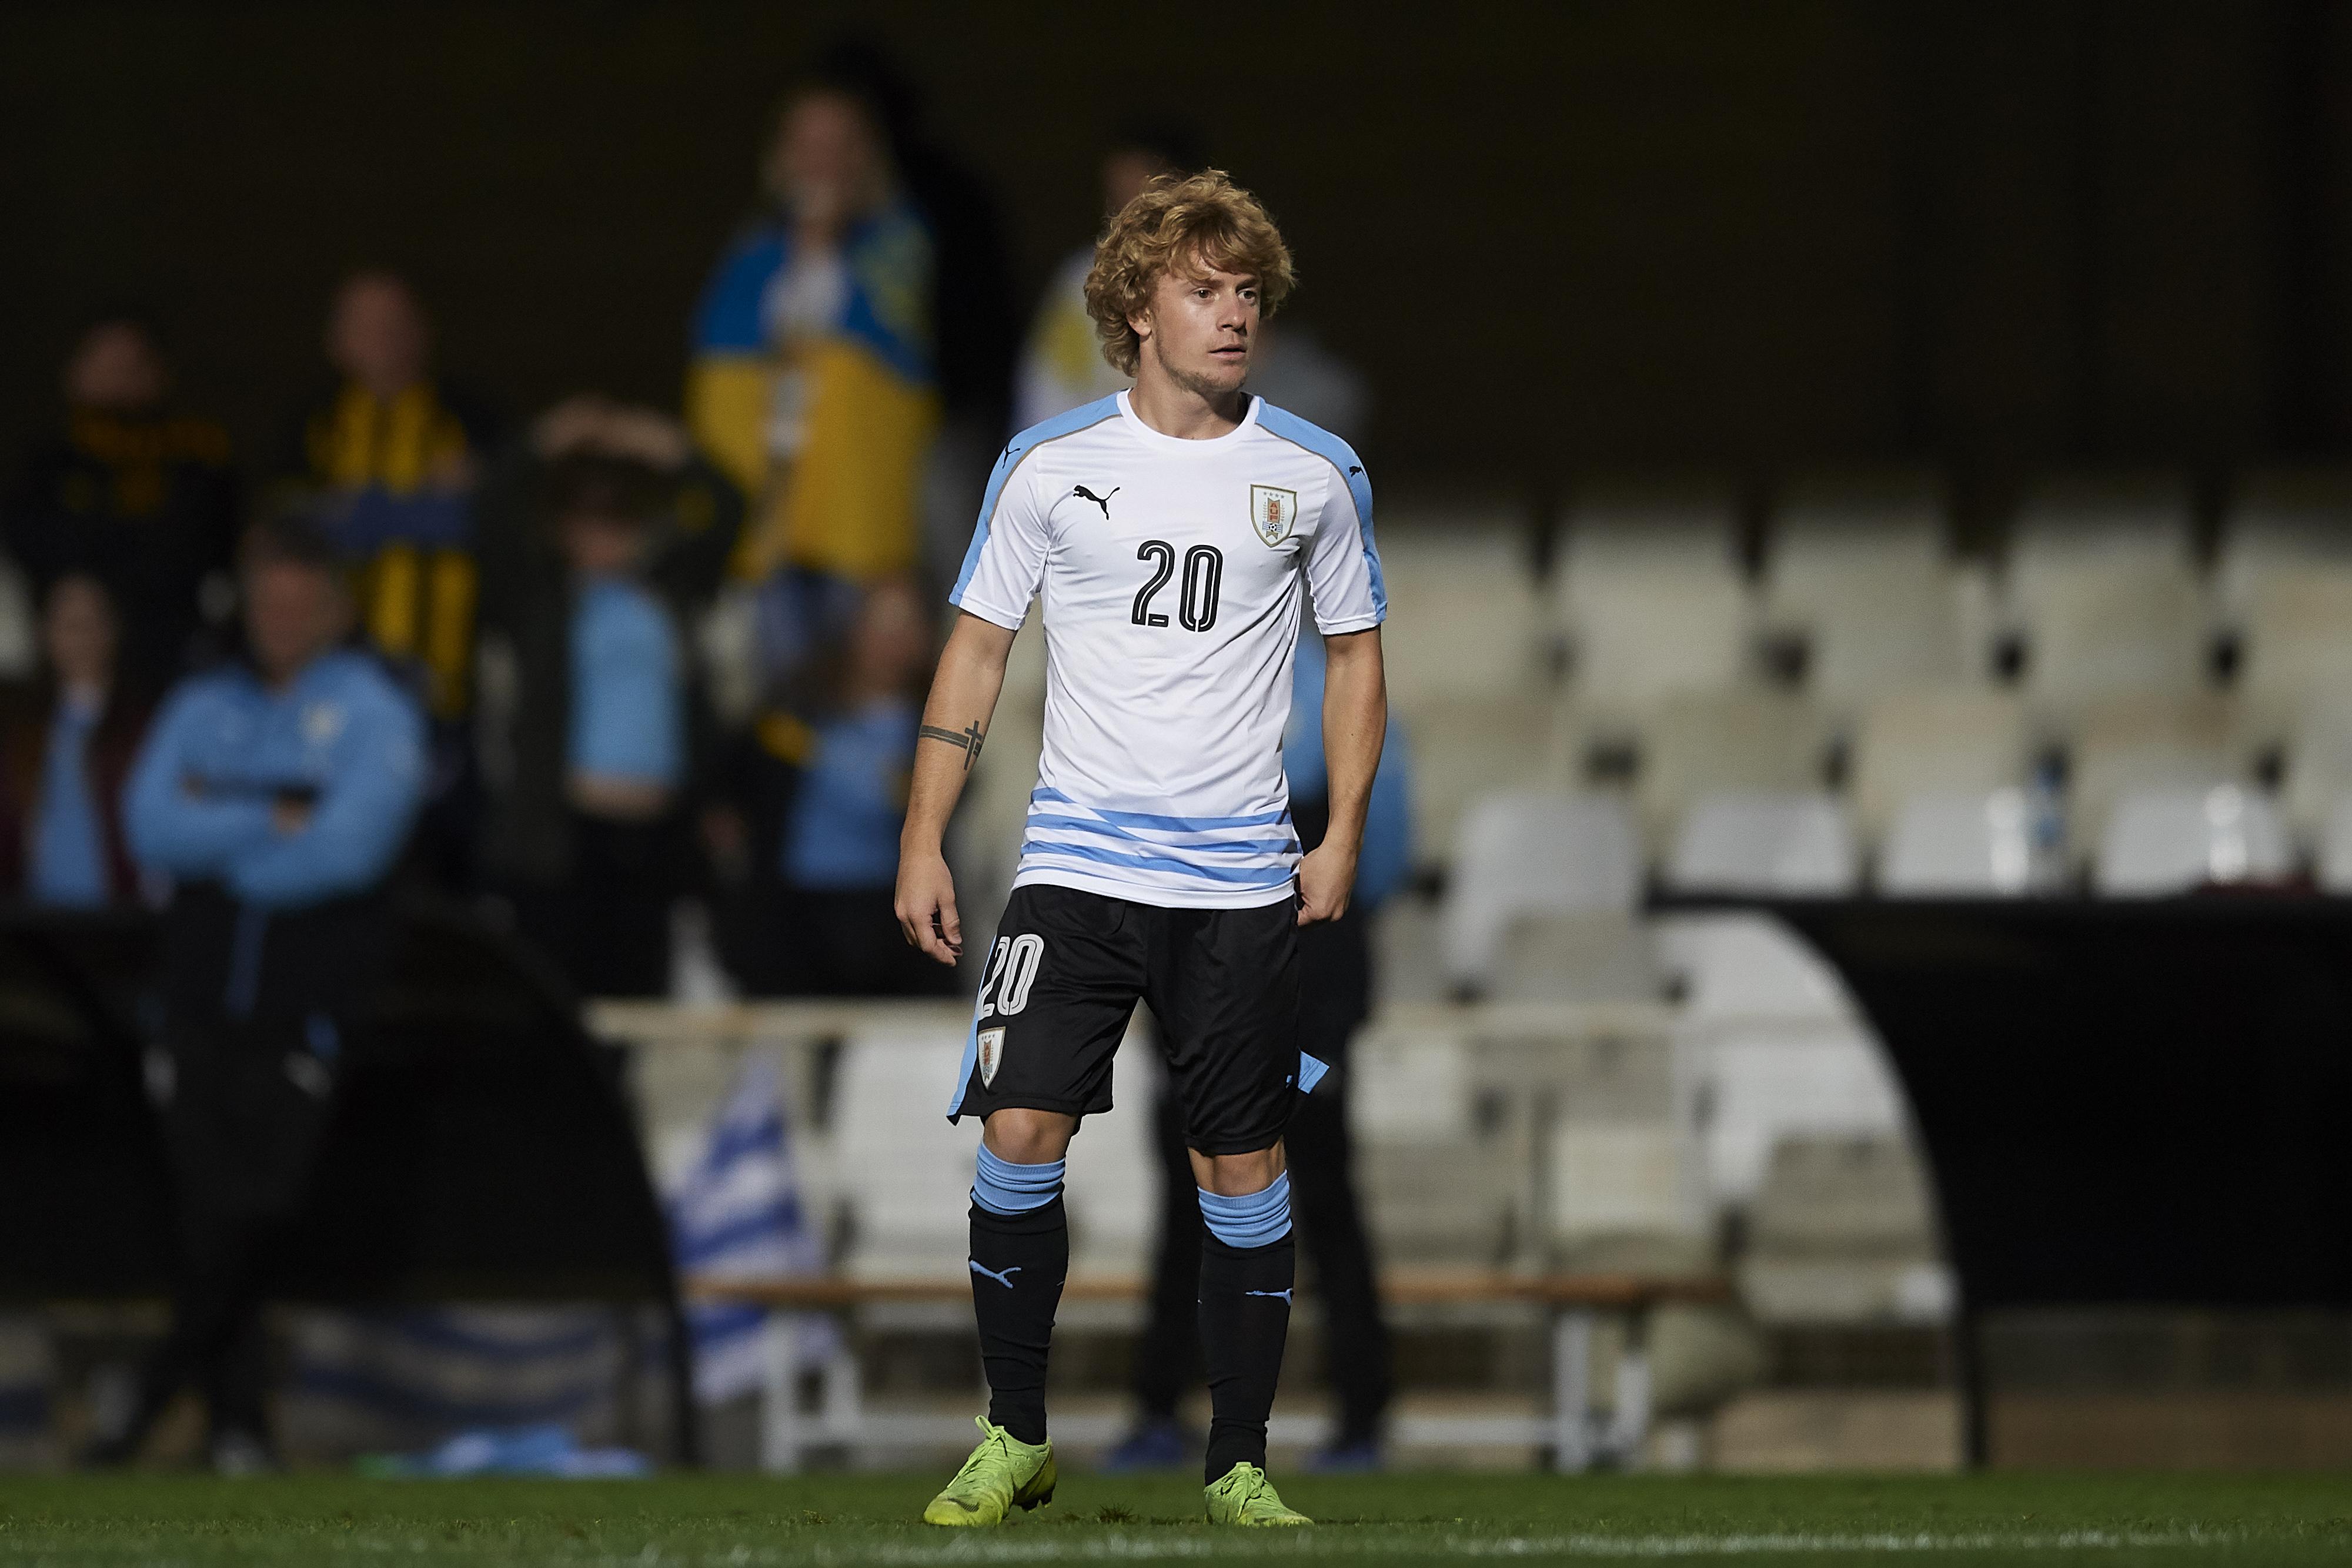 Uruguay U20 V Ukraine U20 - International Friendly